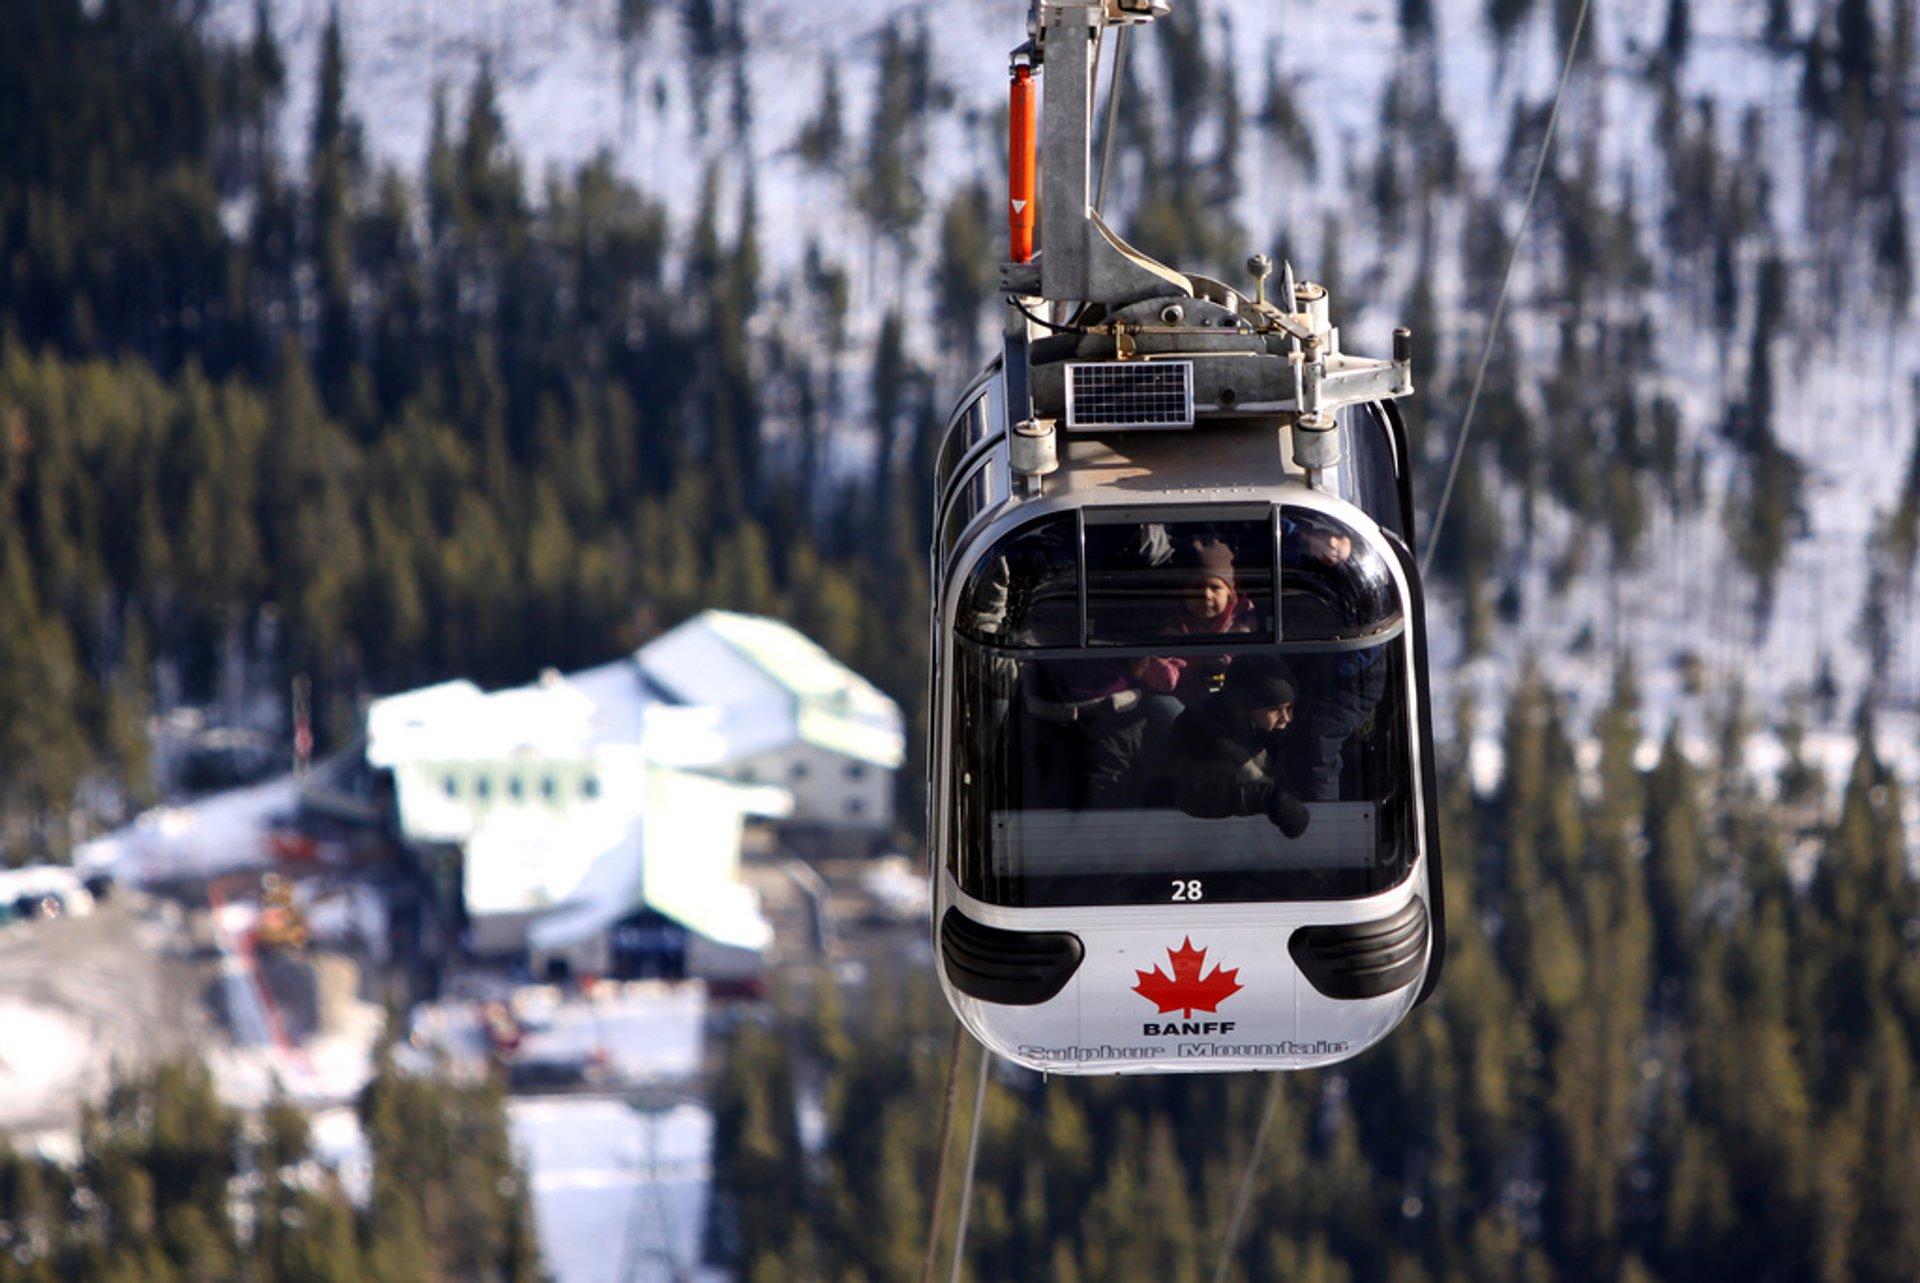 Banff Gondola in Banff & Jasper National Parks 2020 - Best Time